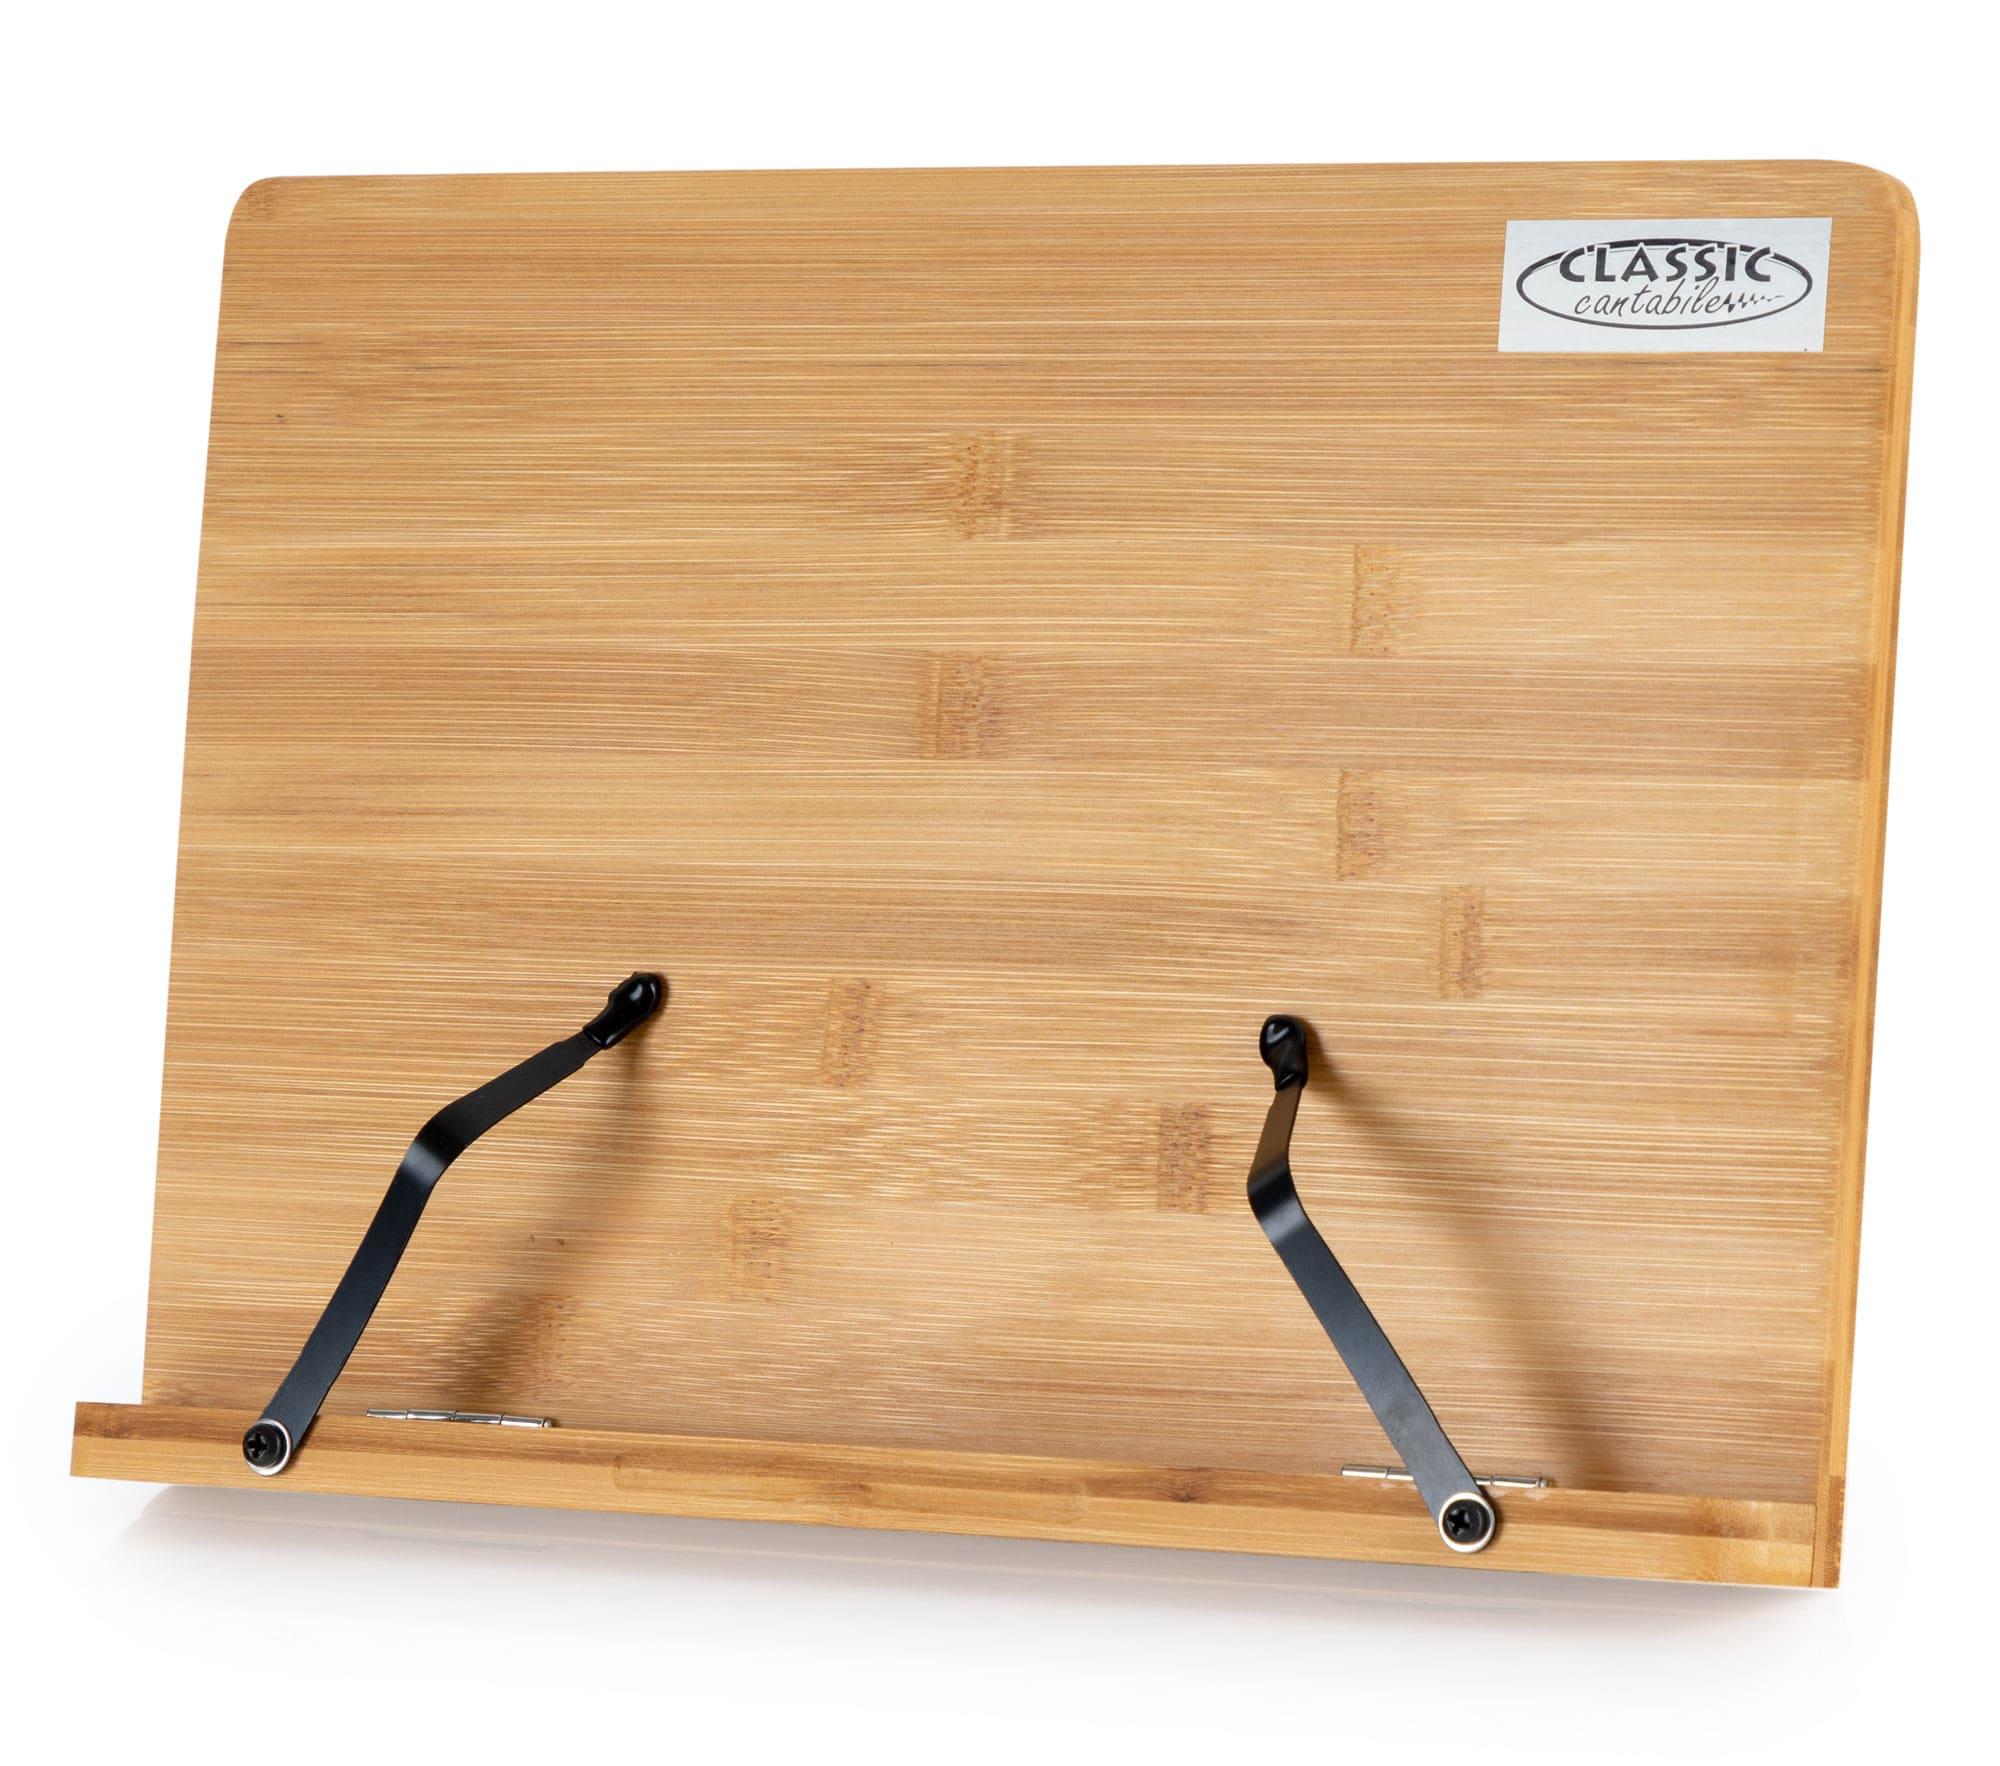 Musikerzubehoer - Classic Cantabile Tischnotenpult Bambus groß - Onlineshop Musikhaus Kirstein